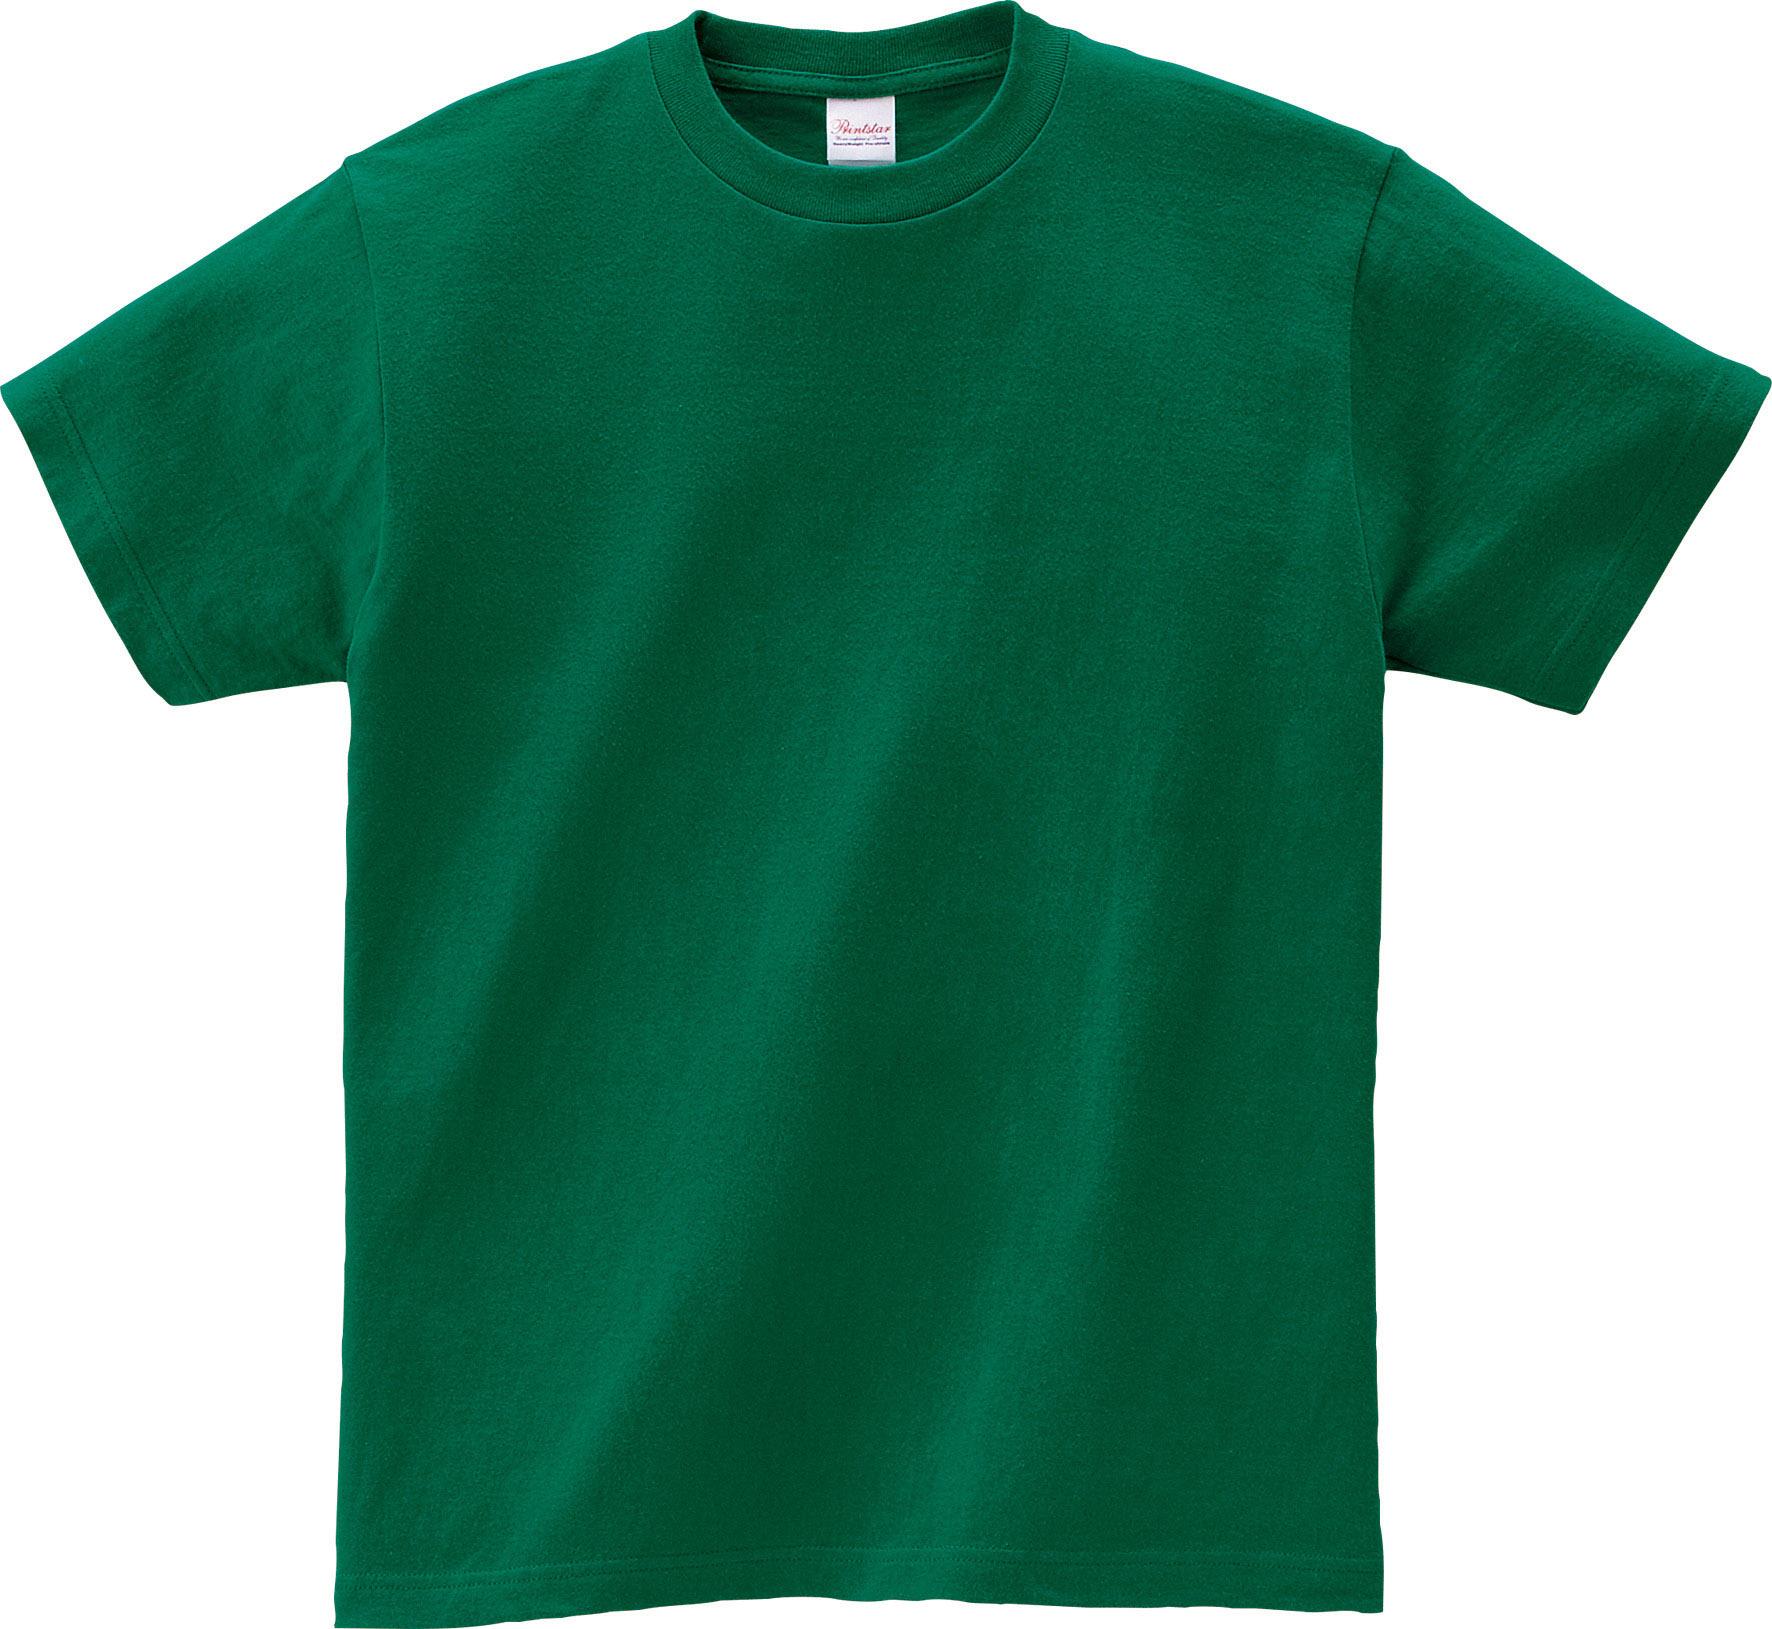 00085-CVT 5.6オンス・ヘビーウェイトTシャツ - 193-ディープグリーン, XXXL